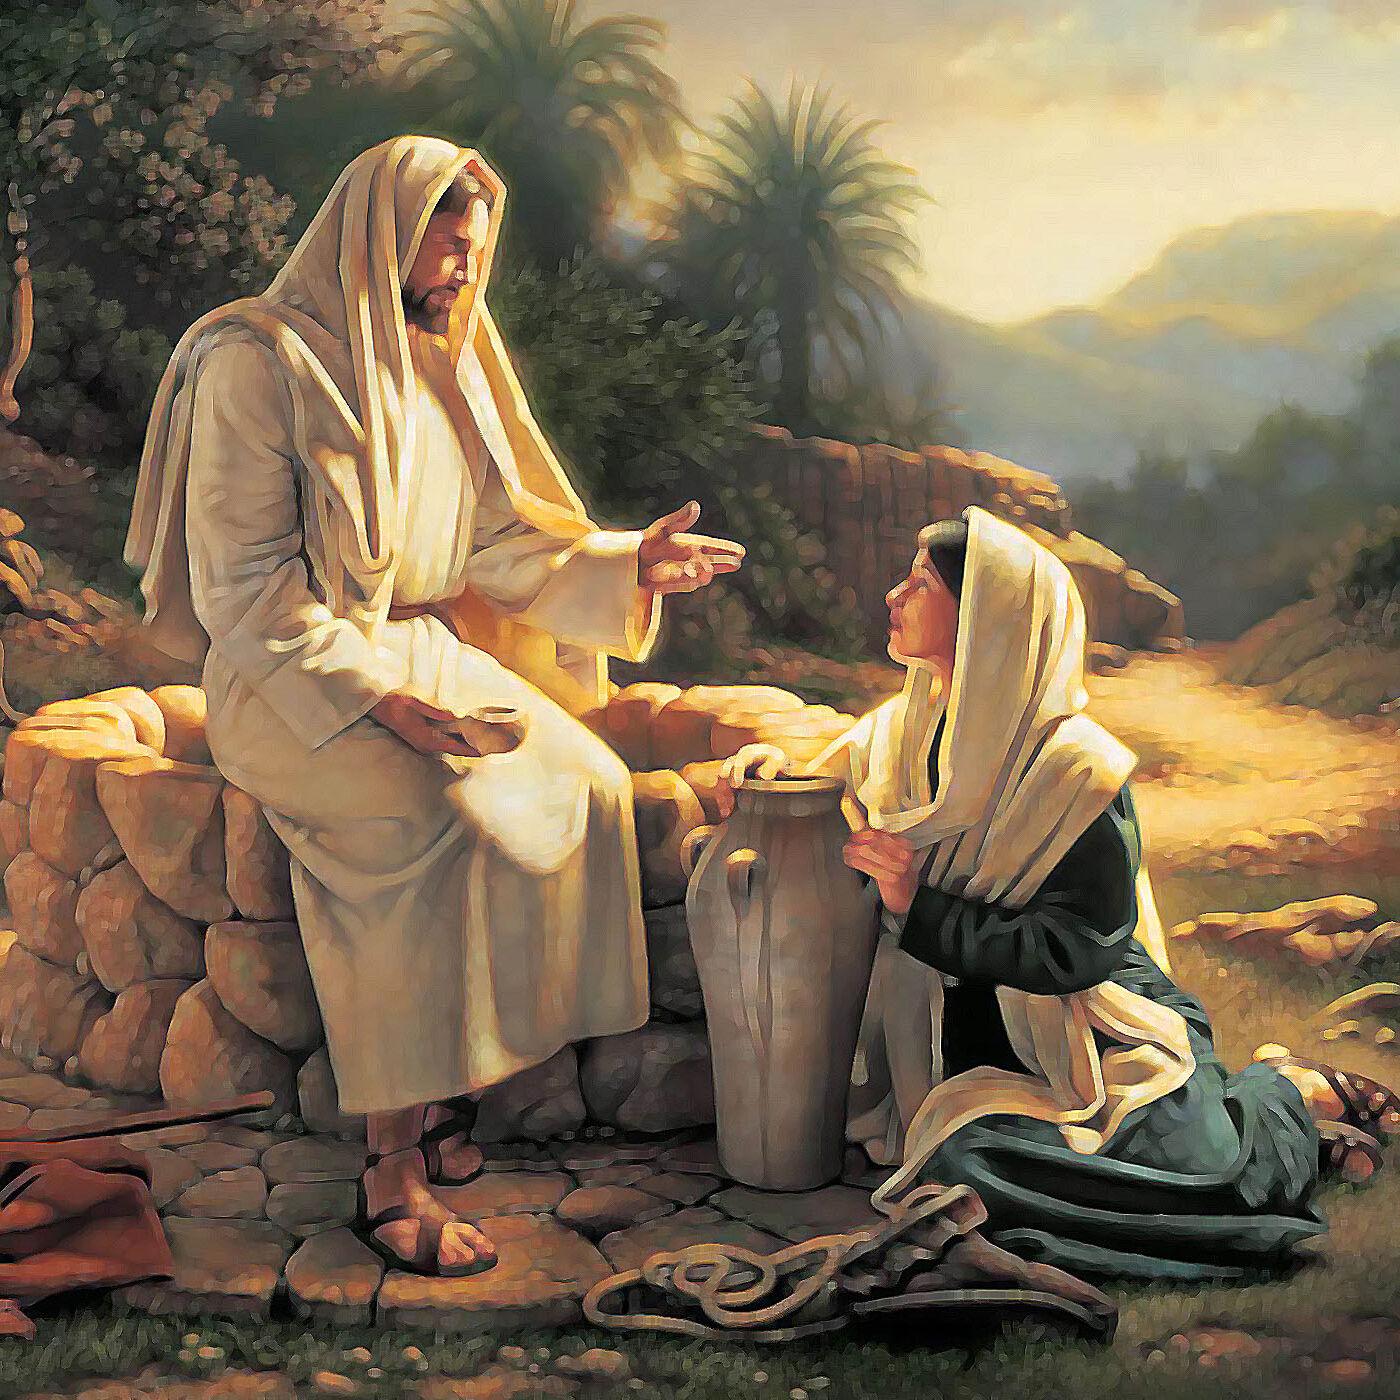 riflessioni sul Vangelo di Martedì 26 Gennaio 2021 (Lc 10, 1-9) - Apostola Janel